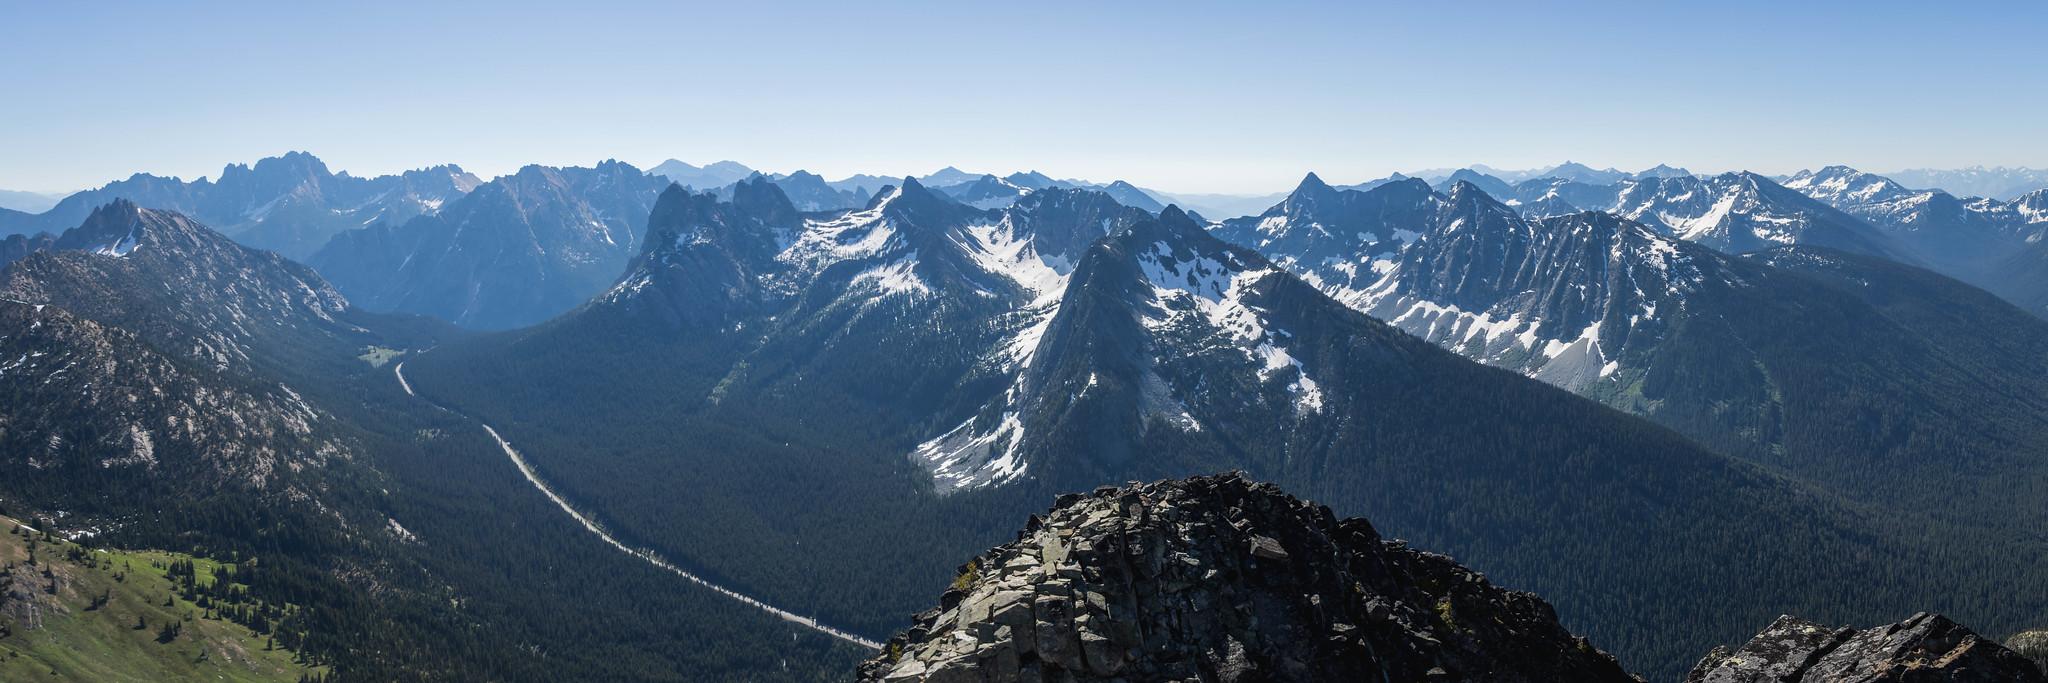 Eastern panoramic view with Washington Pass